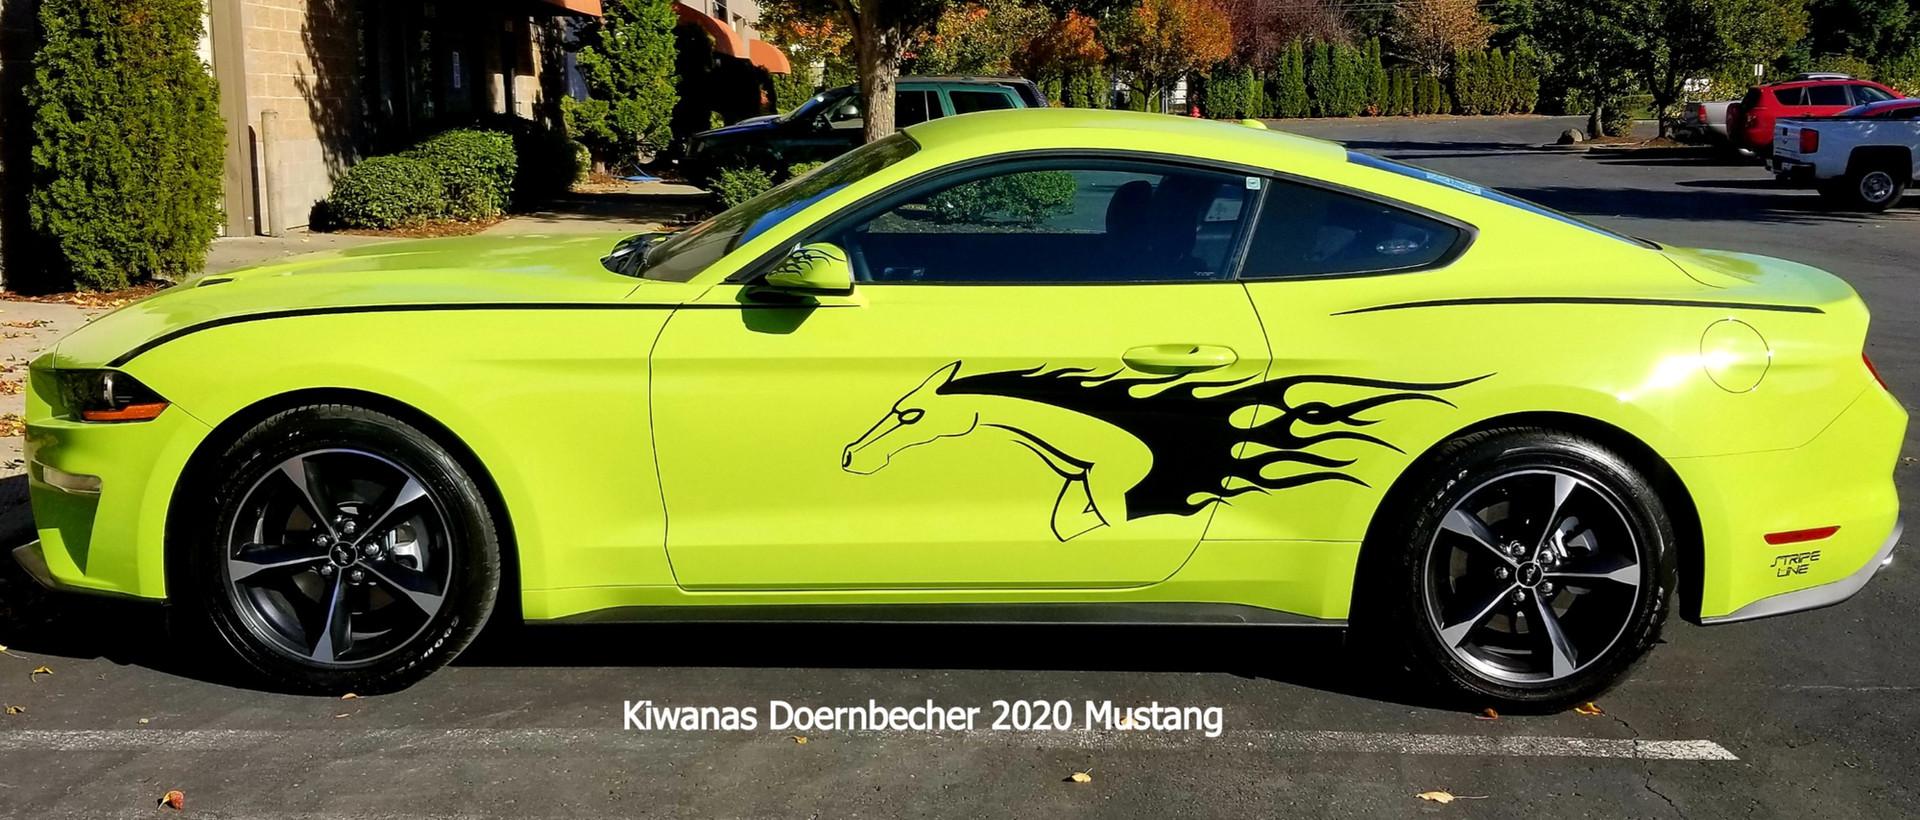 2020 Mustang Kiwanas Doernbecher2_edited